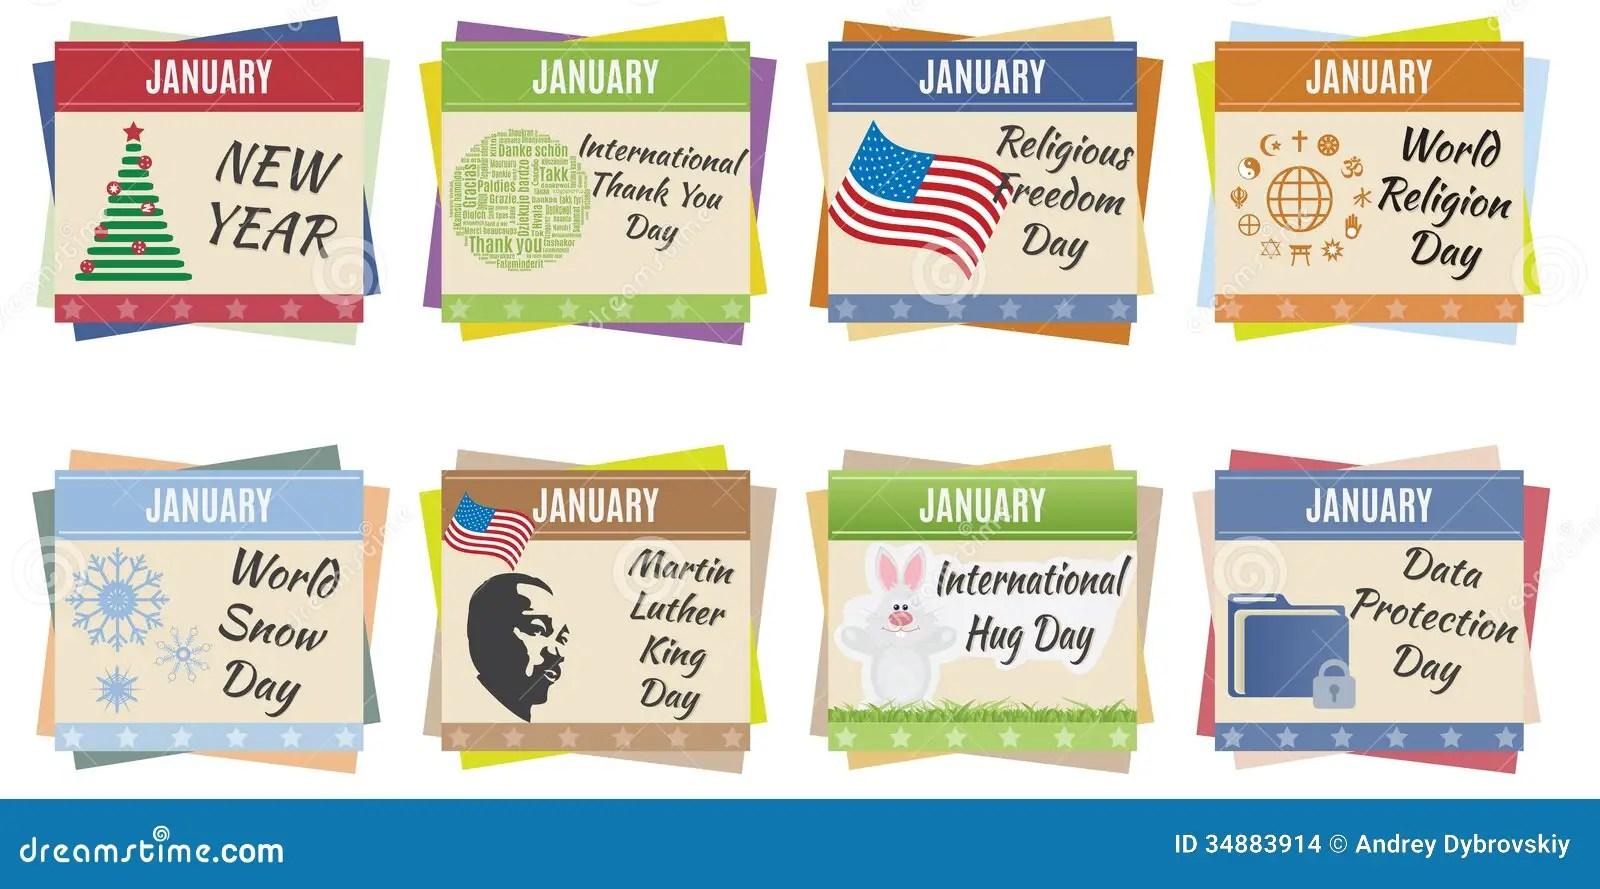 Image Result For World Holiday Calendar